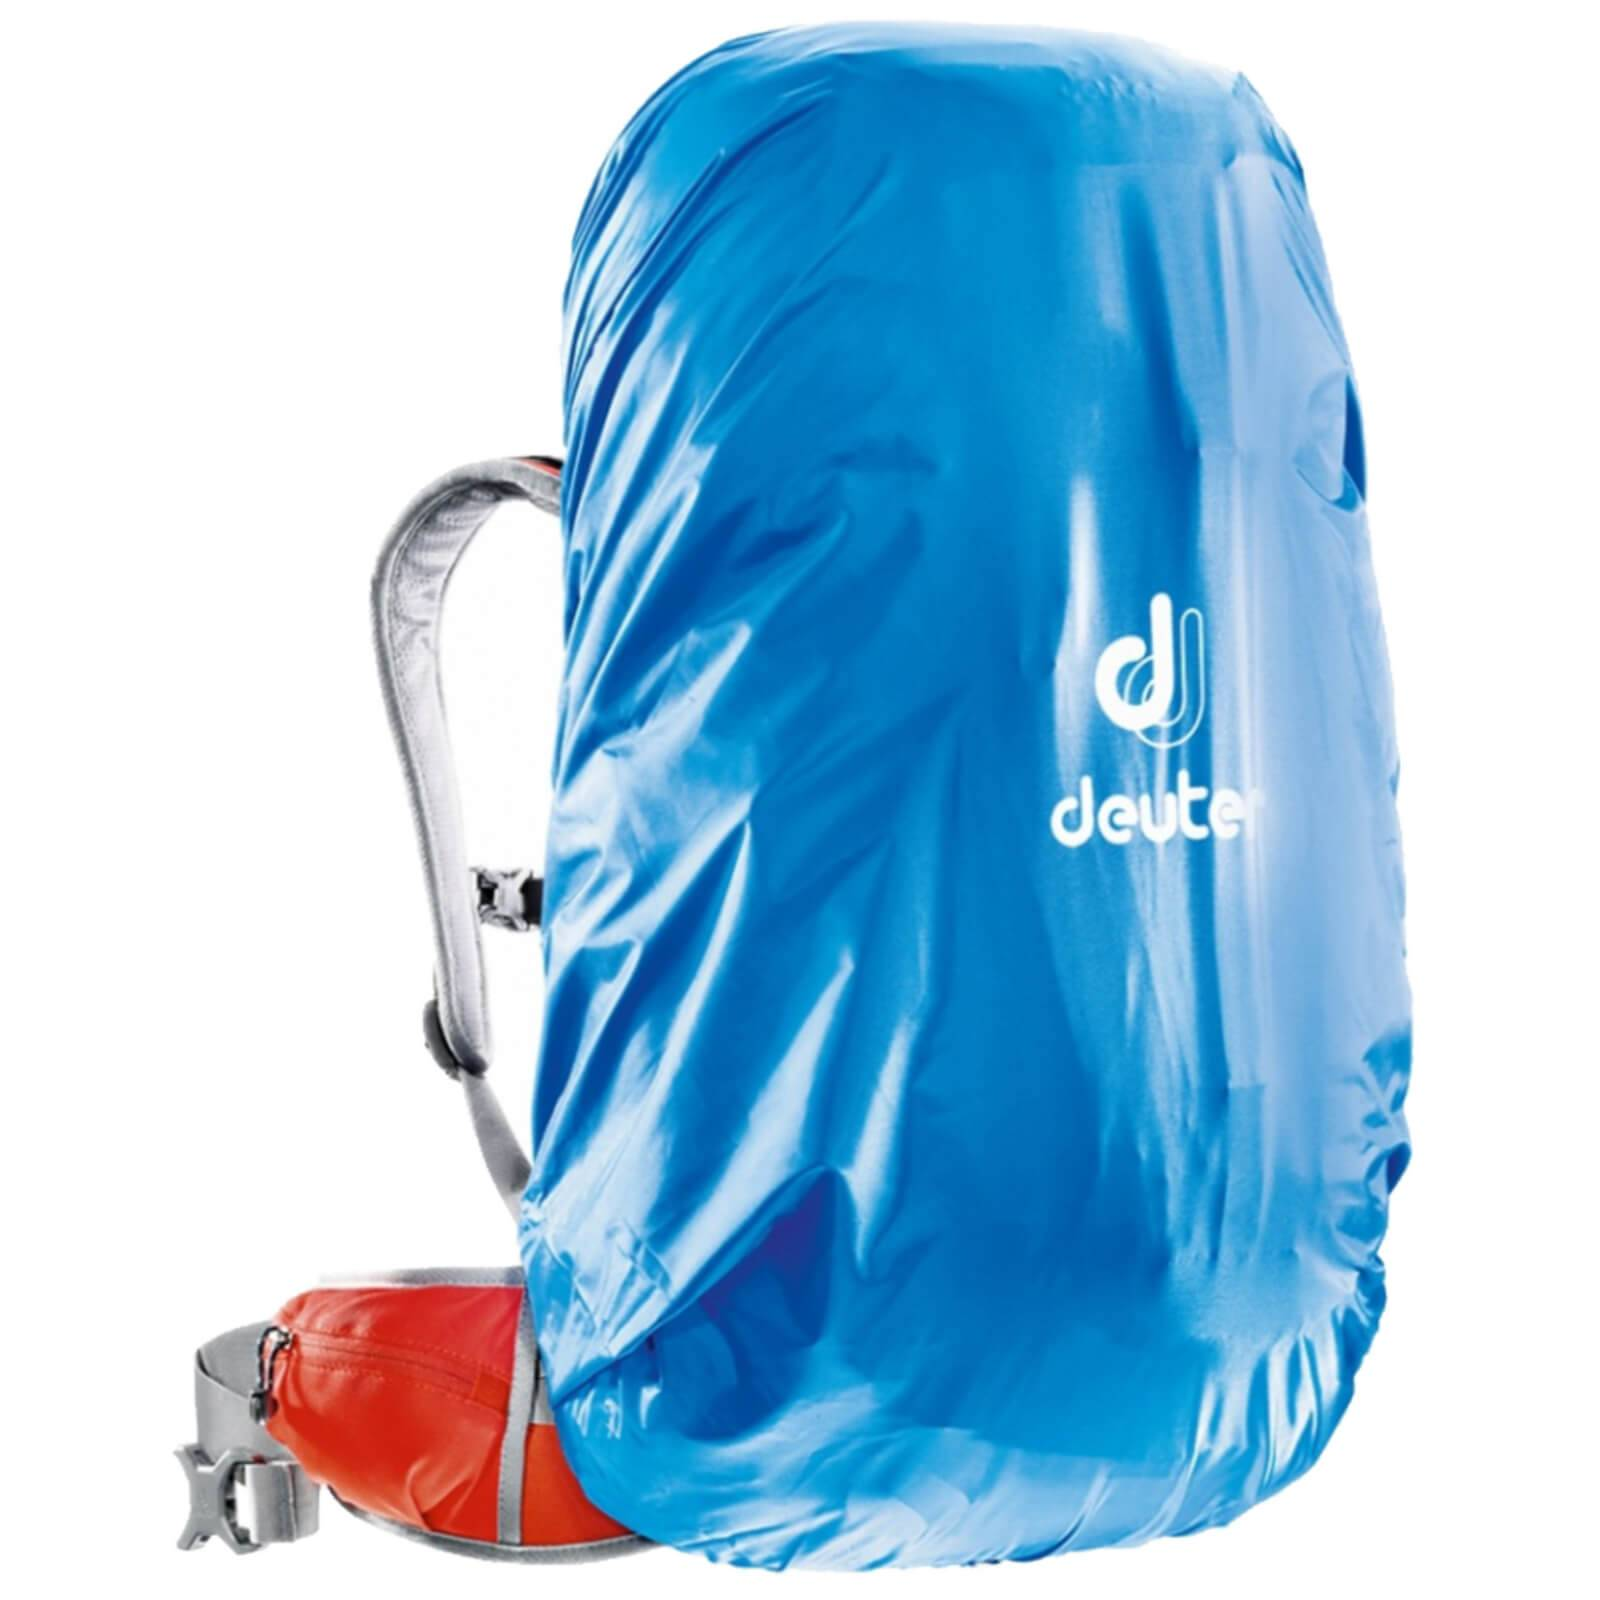 Deuter Backpack Raincover 2 - Cool Blue